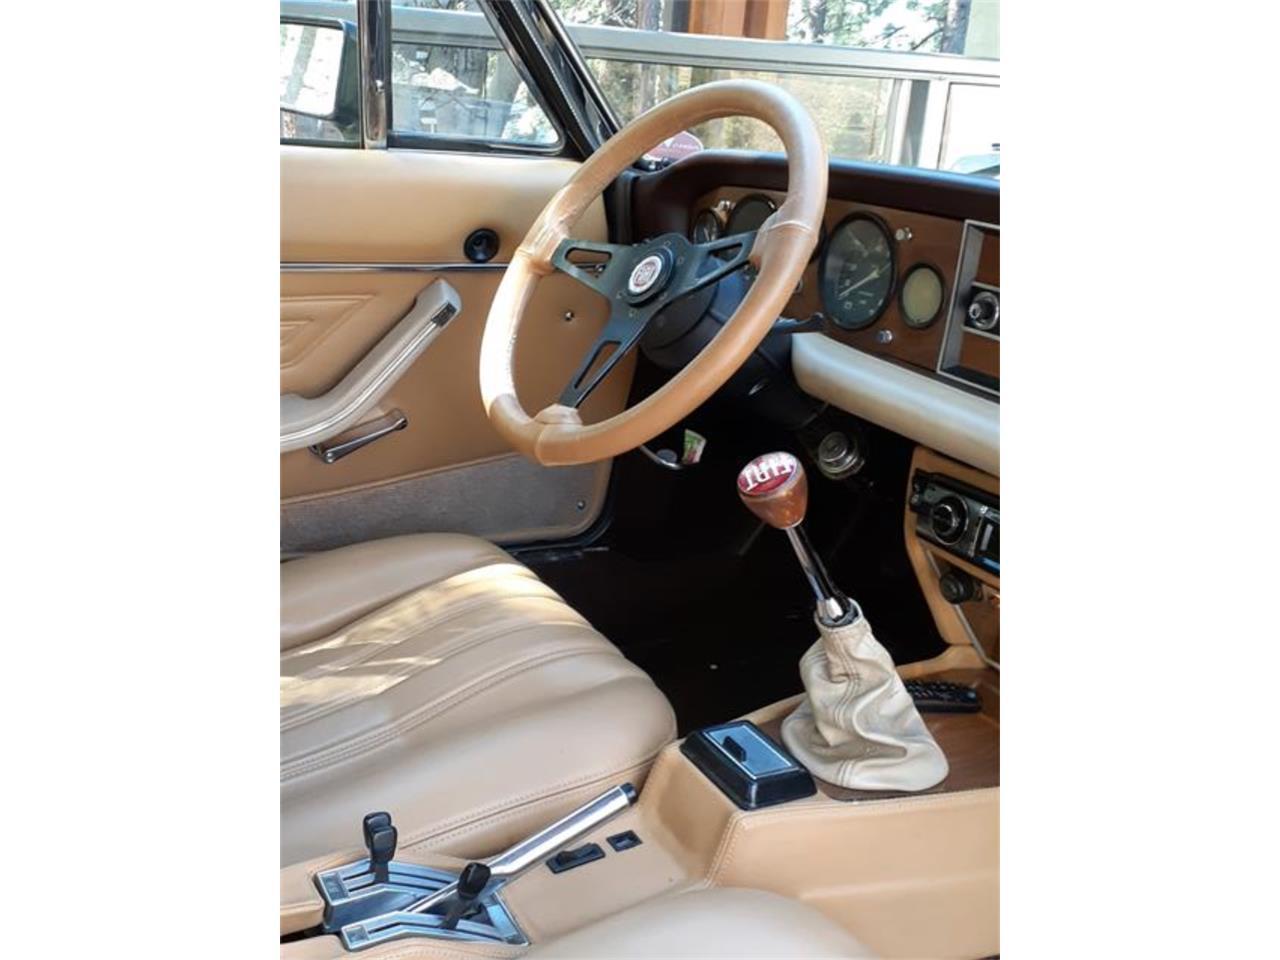 1981 Fiat 124 Spider 2000 (CC-1351614) for sale in INCLINE VILLAGE, Nevada